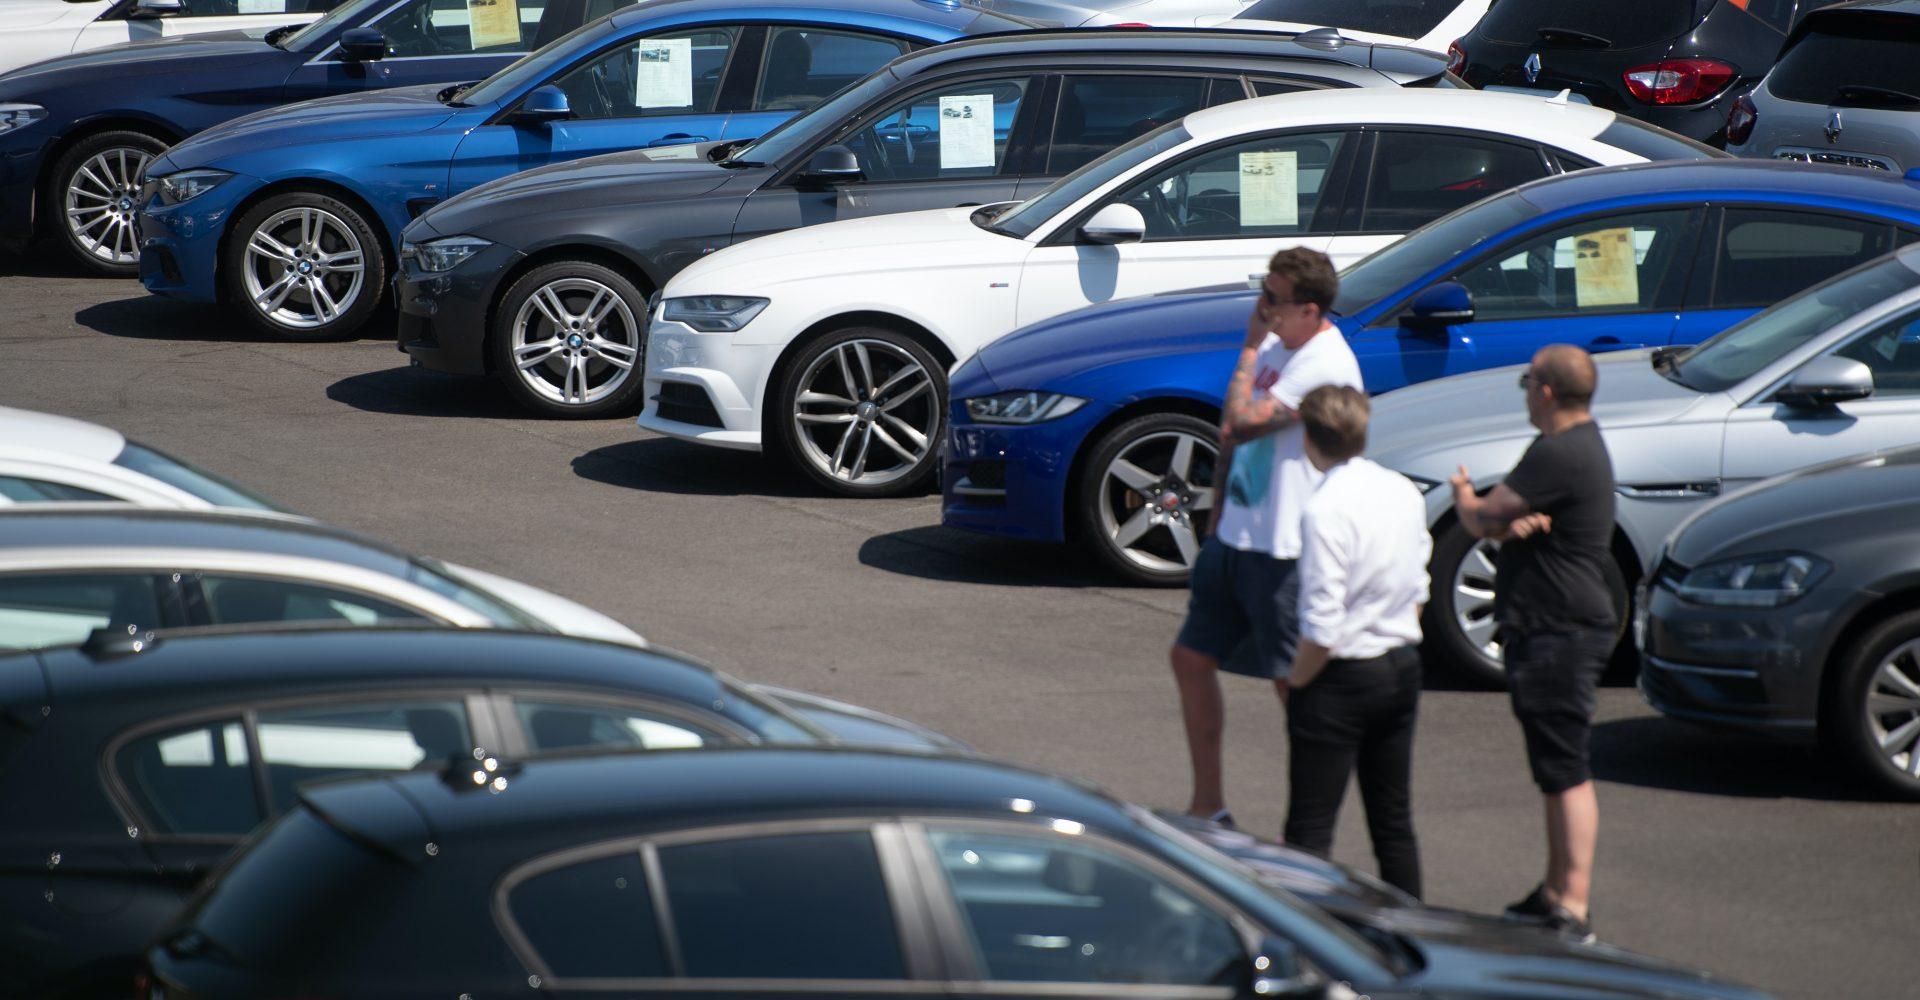 Vertu Motors sees £20m losses from lockdown in April and May